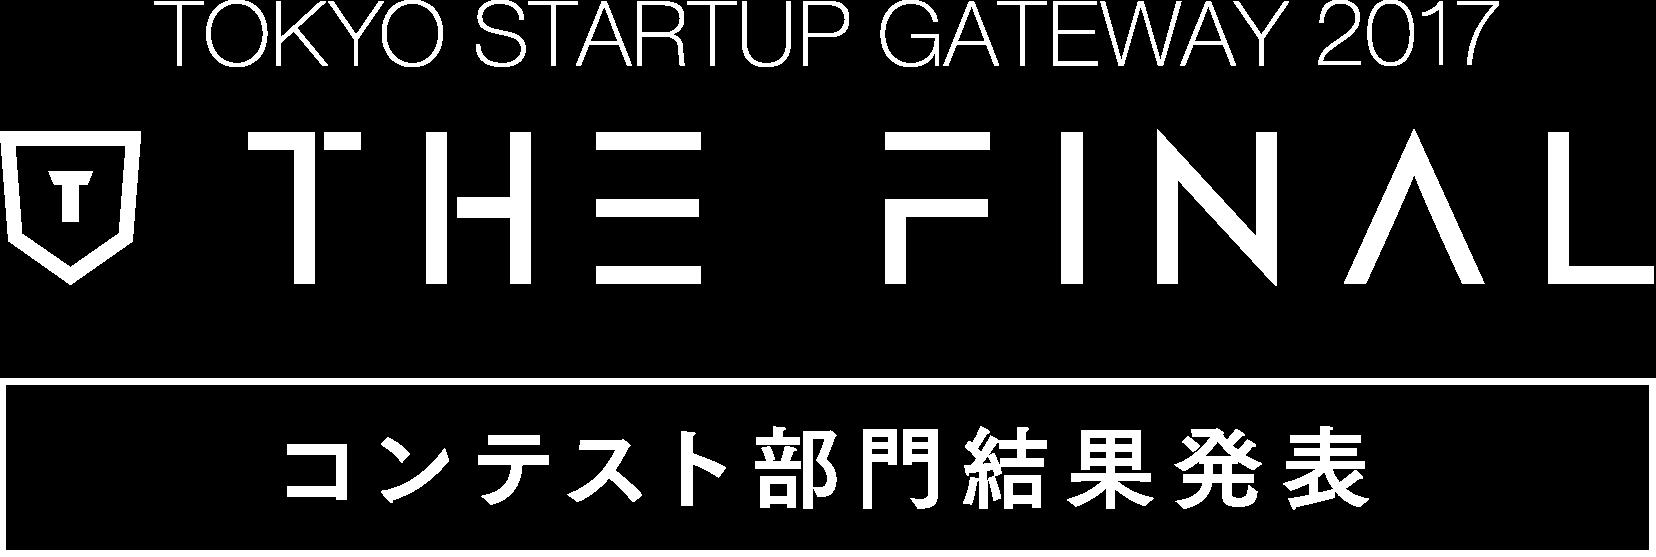 TOKYO STARTUP GATEWAY 2017 コンテスト部門 結果発表